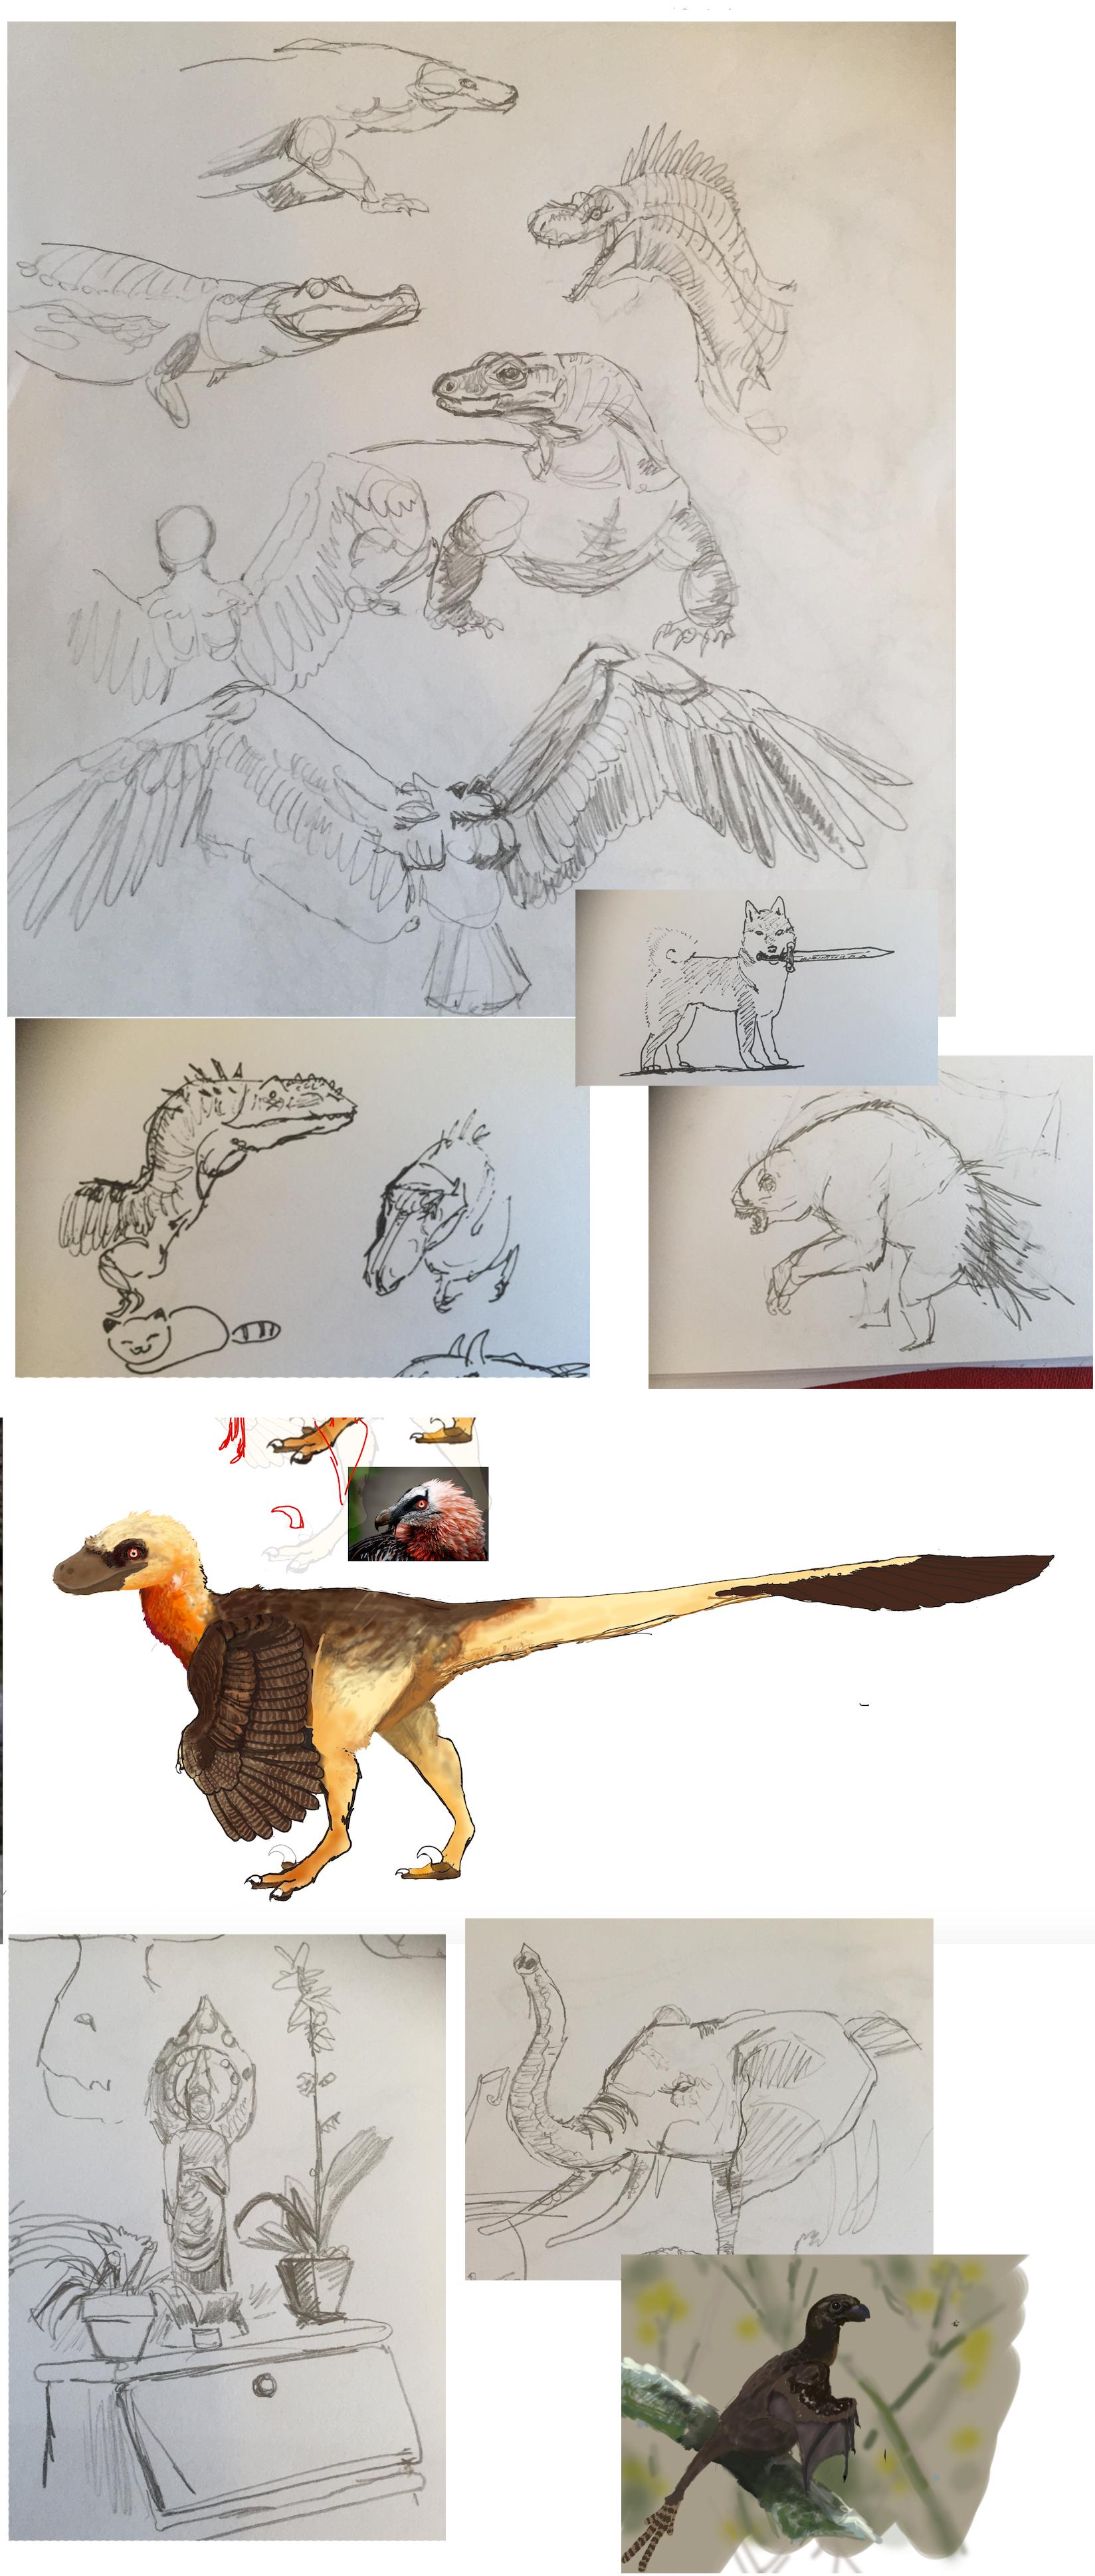 [Image: sketchdump1_by_zemie-d9musjc.png]